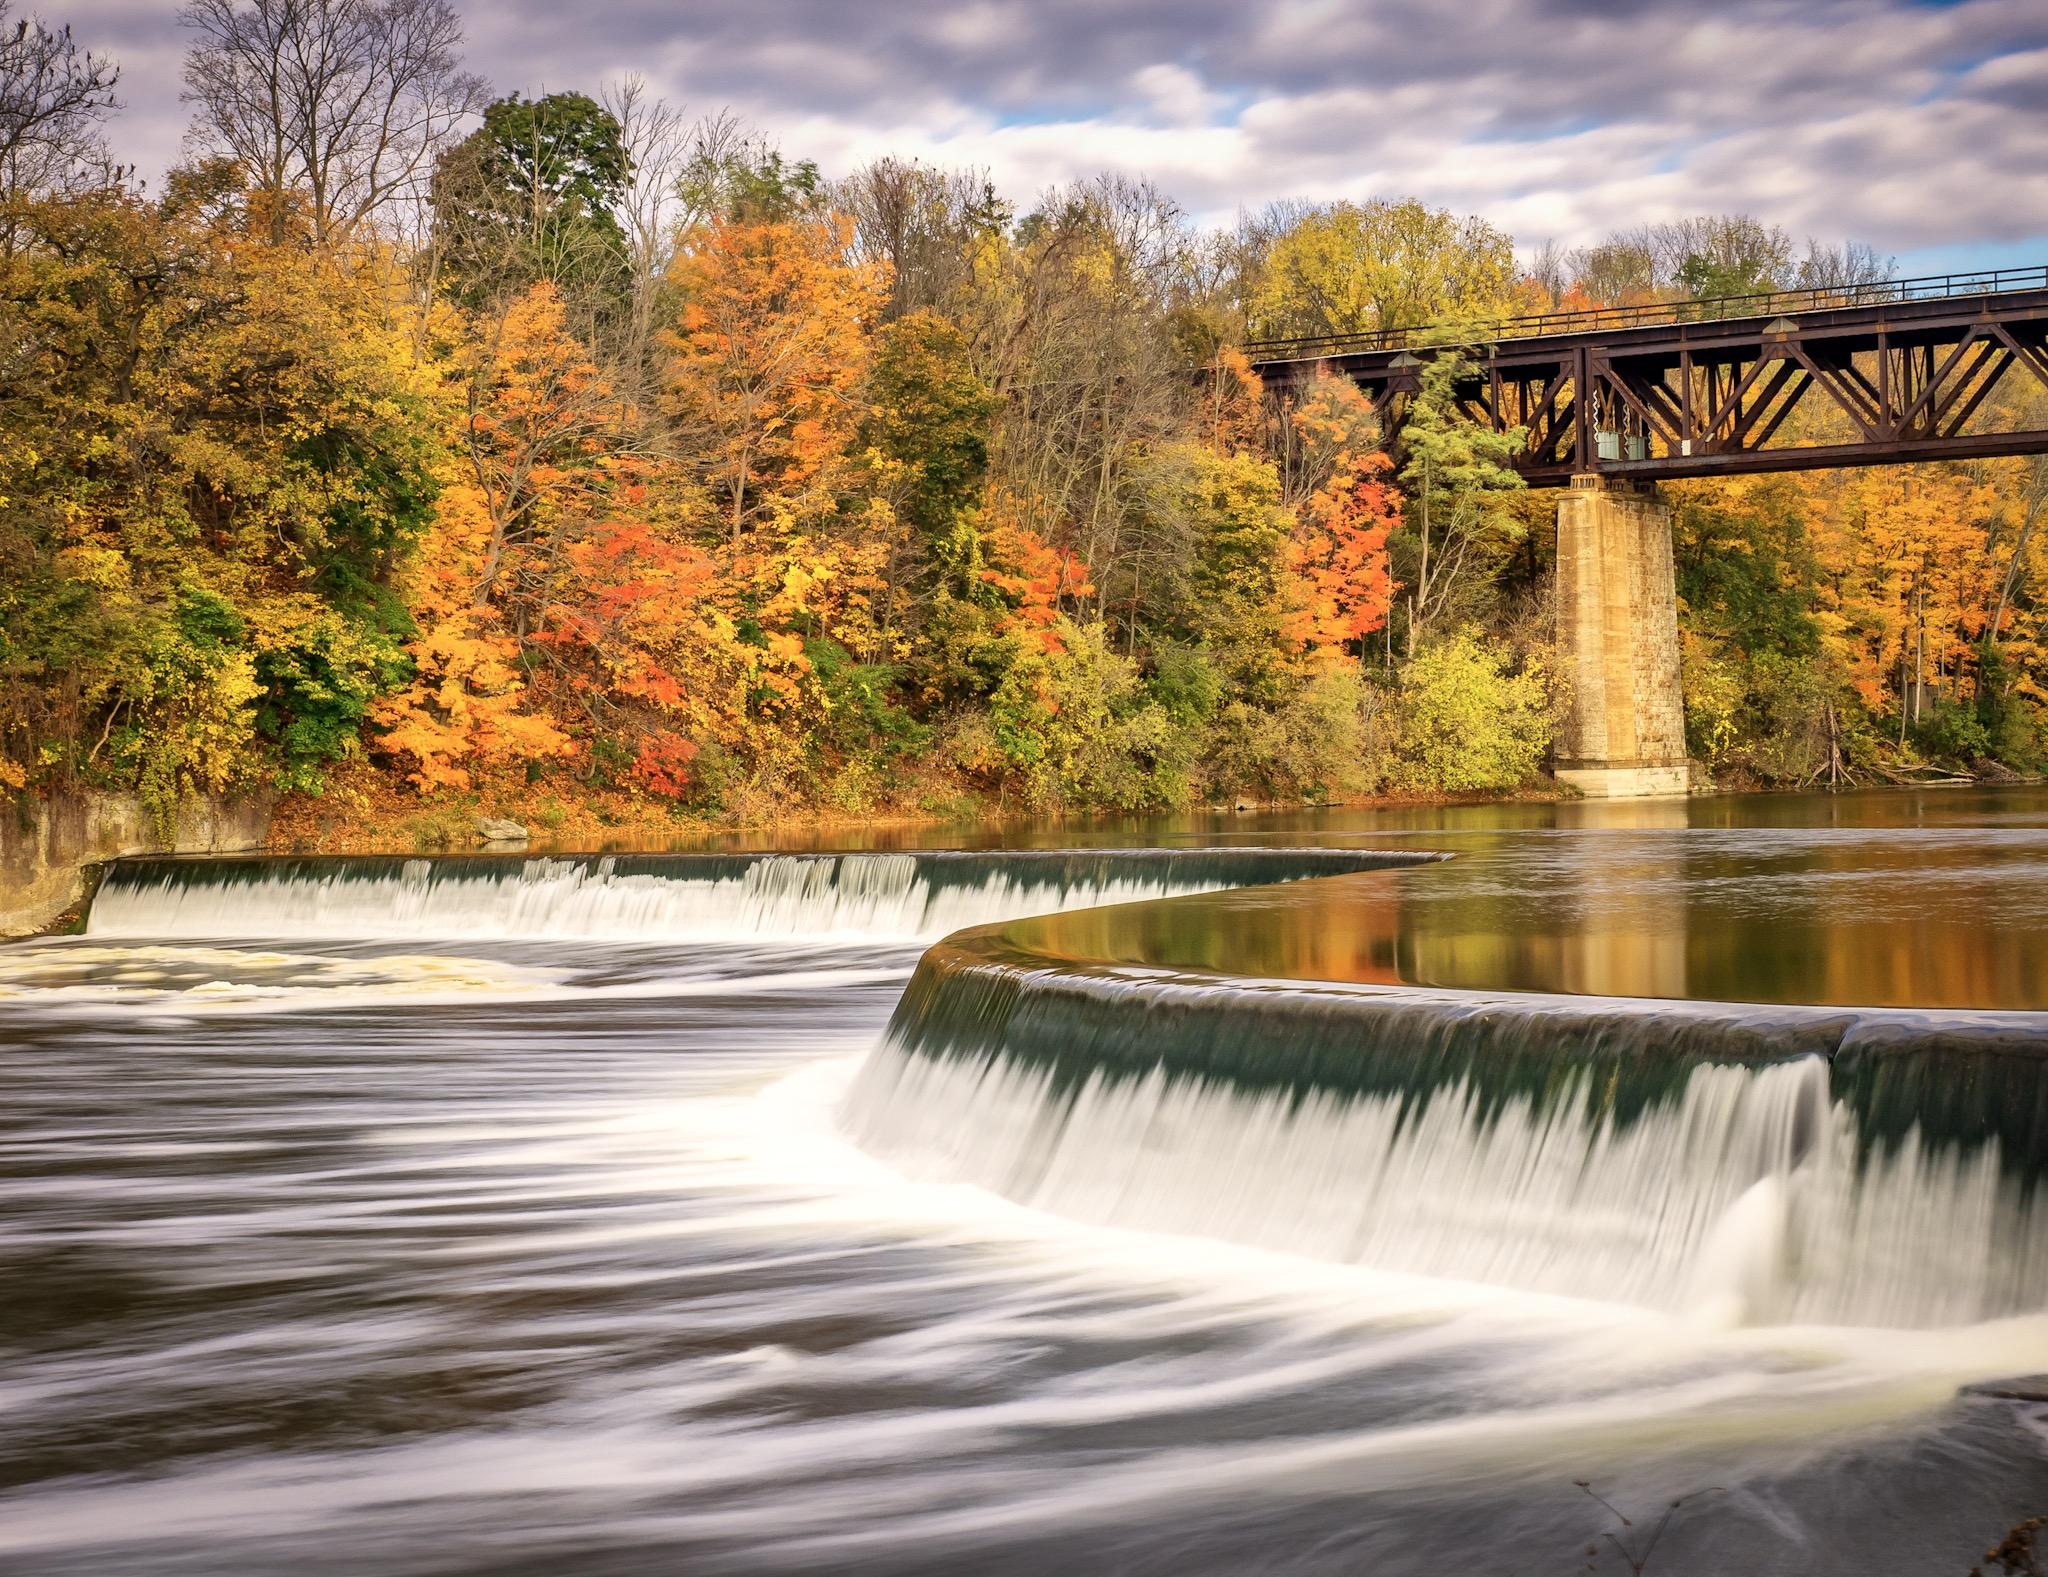 Grand river, Paris,Ontario, Canada